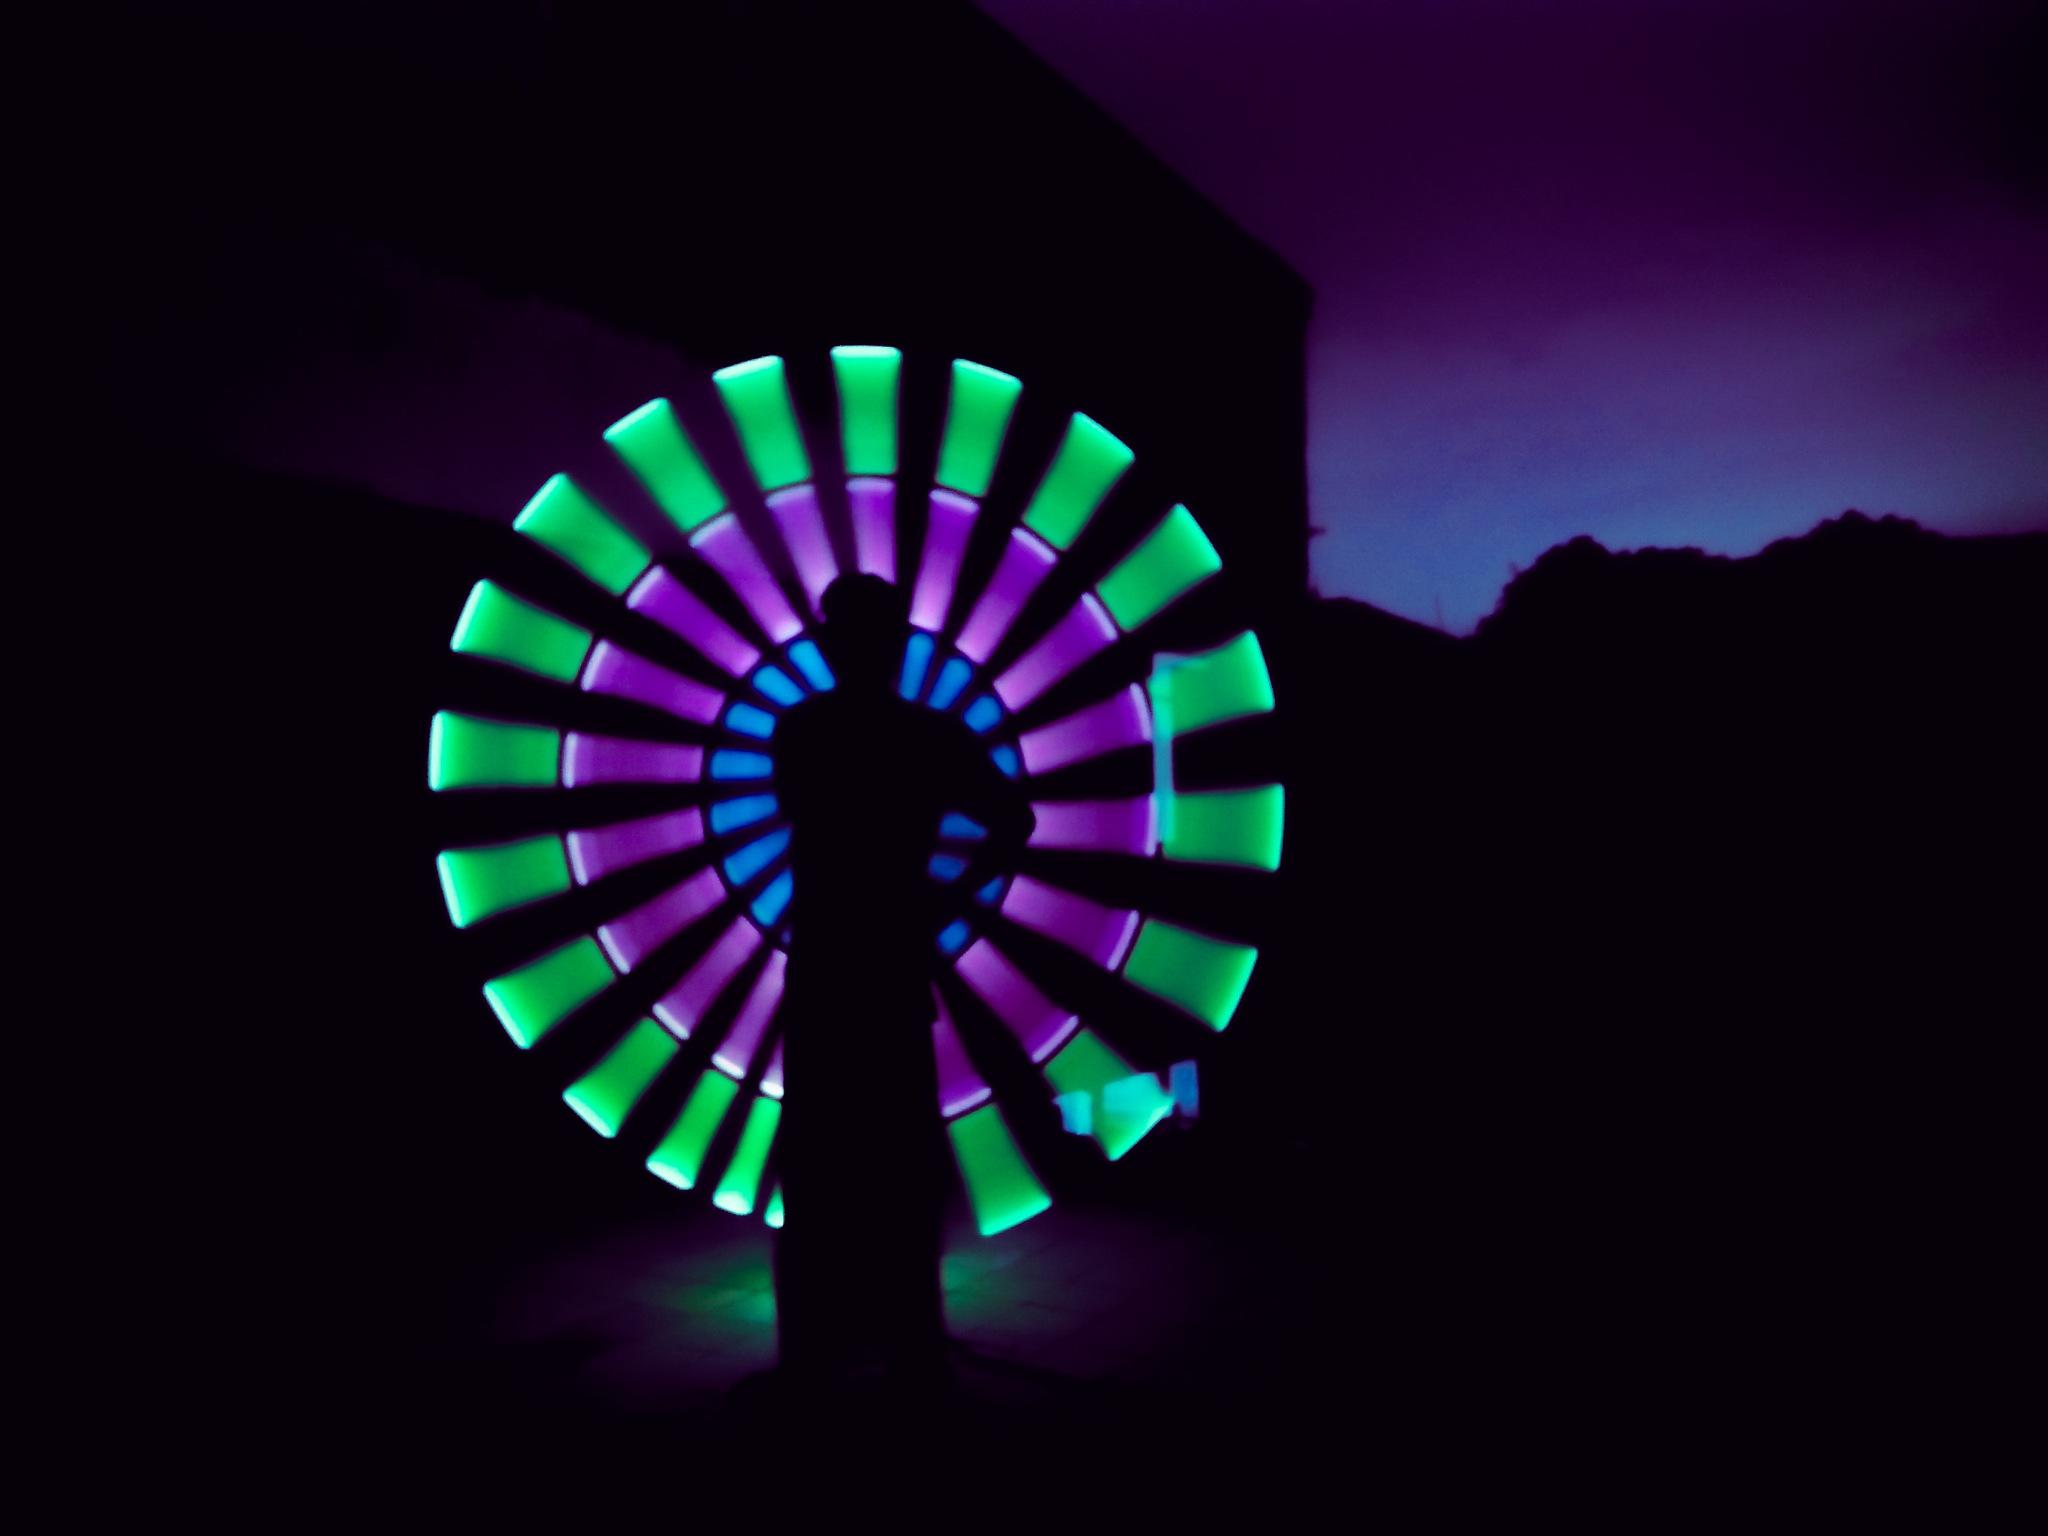 lightpainting by Amarzuki Dani